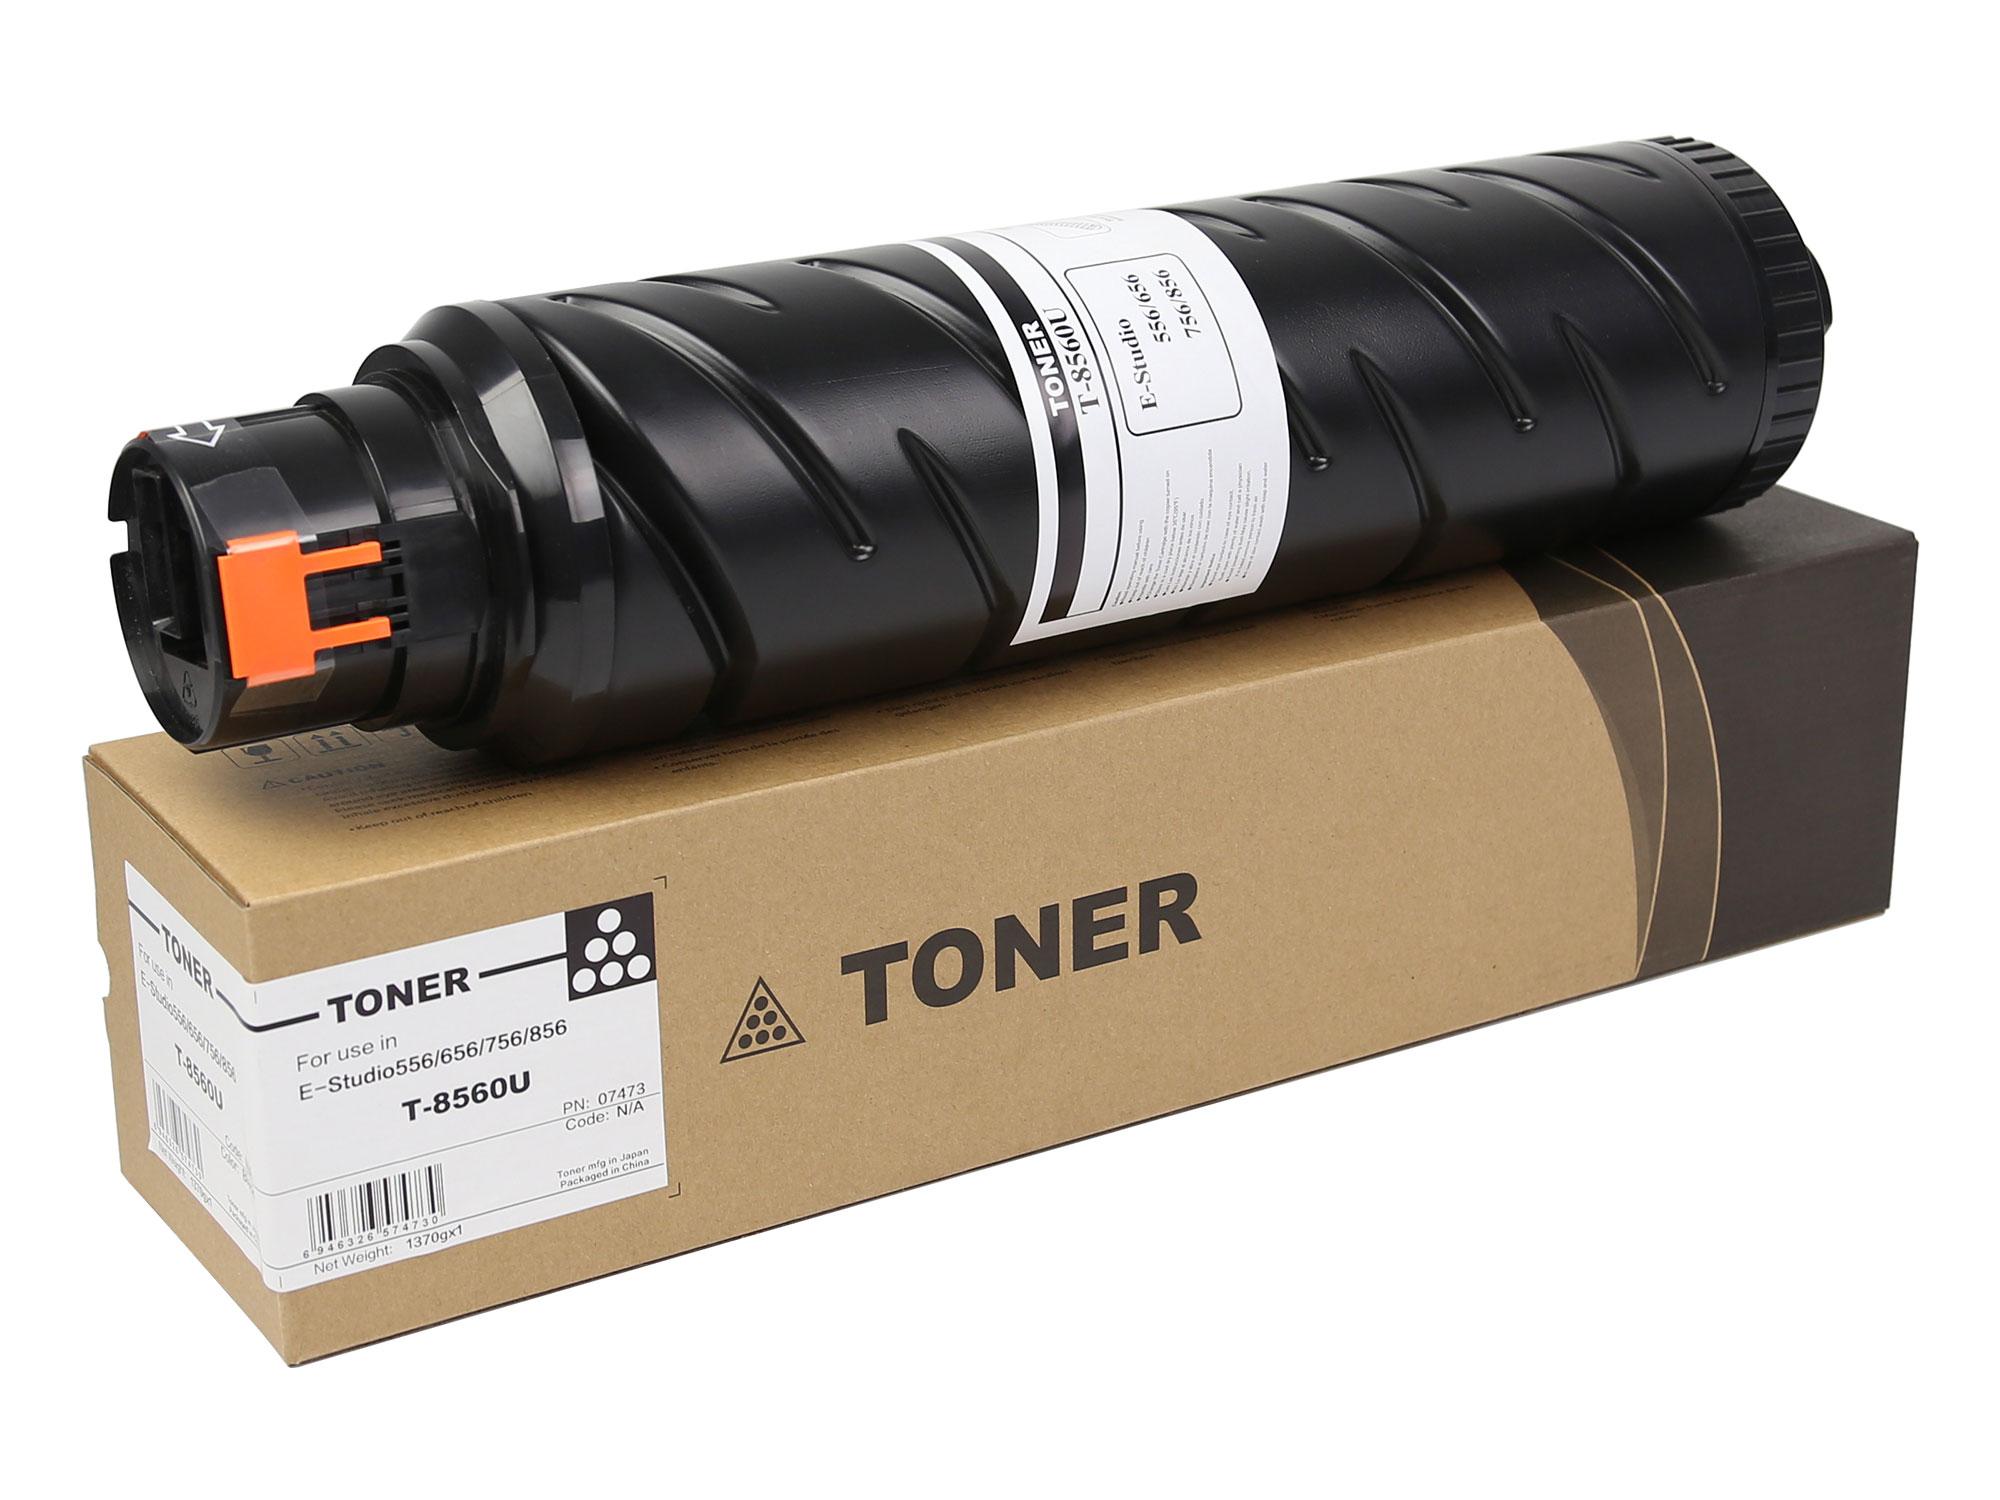 6AK00000212 T-8560U Toner Cartridge for Toshiba E-Studio 556